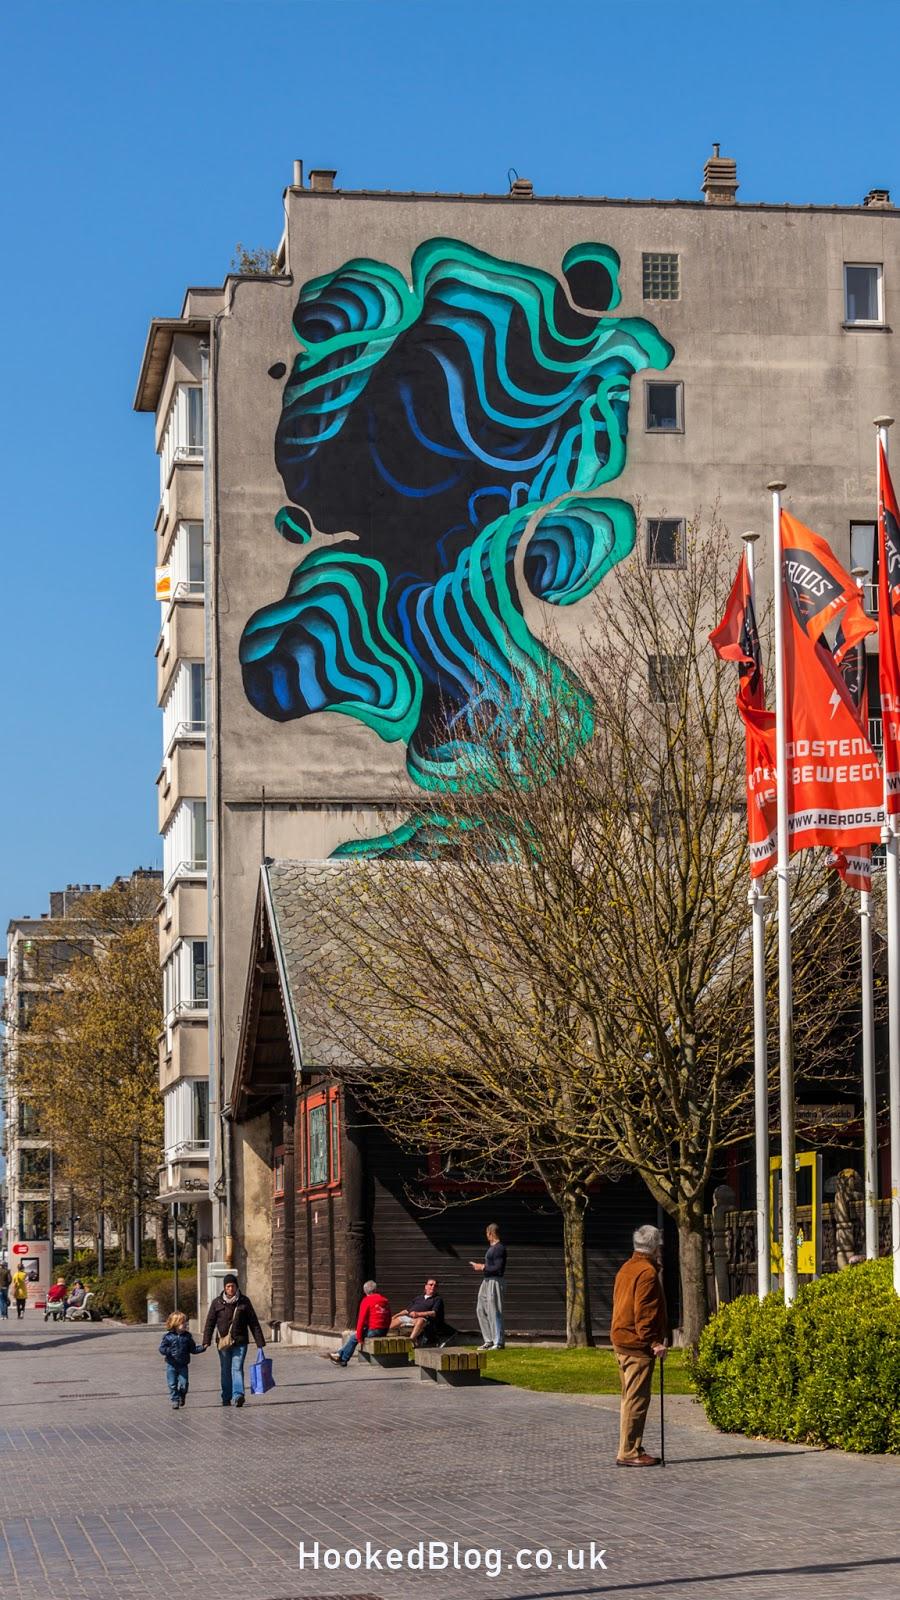 Street Artist 1010 large scale mural in Ostend, Belgium. Photo ©Hookedblog